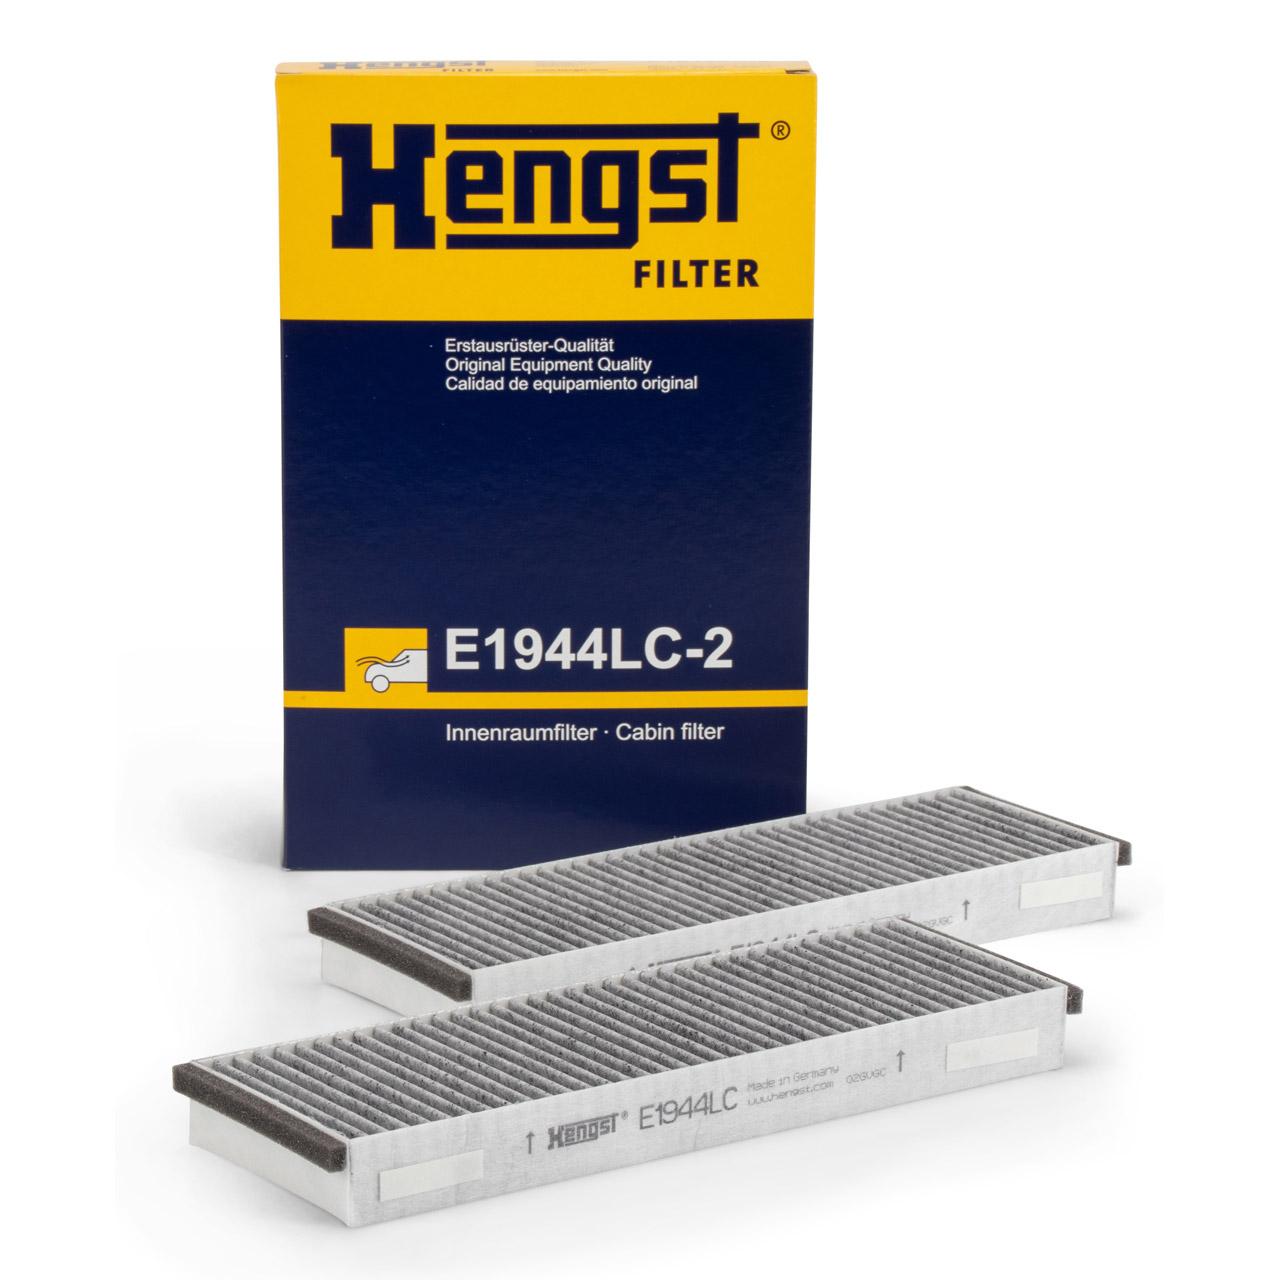 HENGST E1944LC-2 Innenraumfilter Aktivkohle Satz für AUDI A6 (4F C6) R8 VW XL1